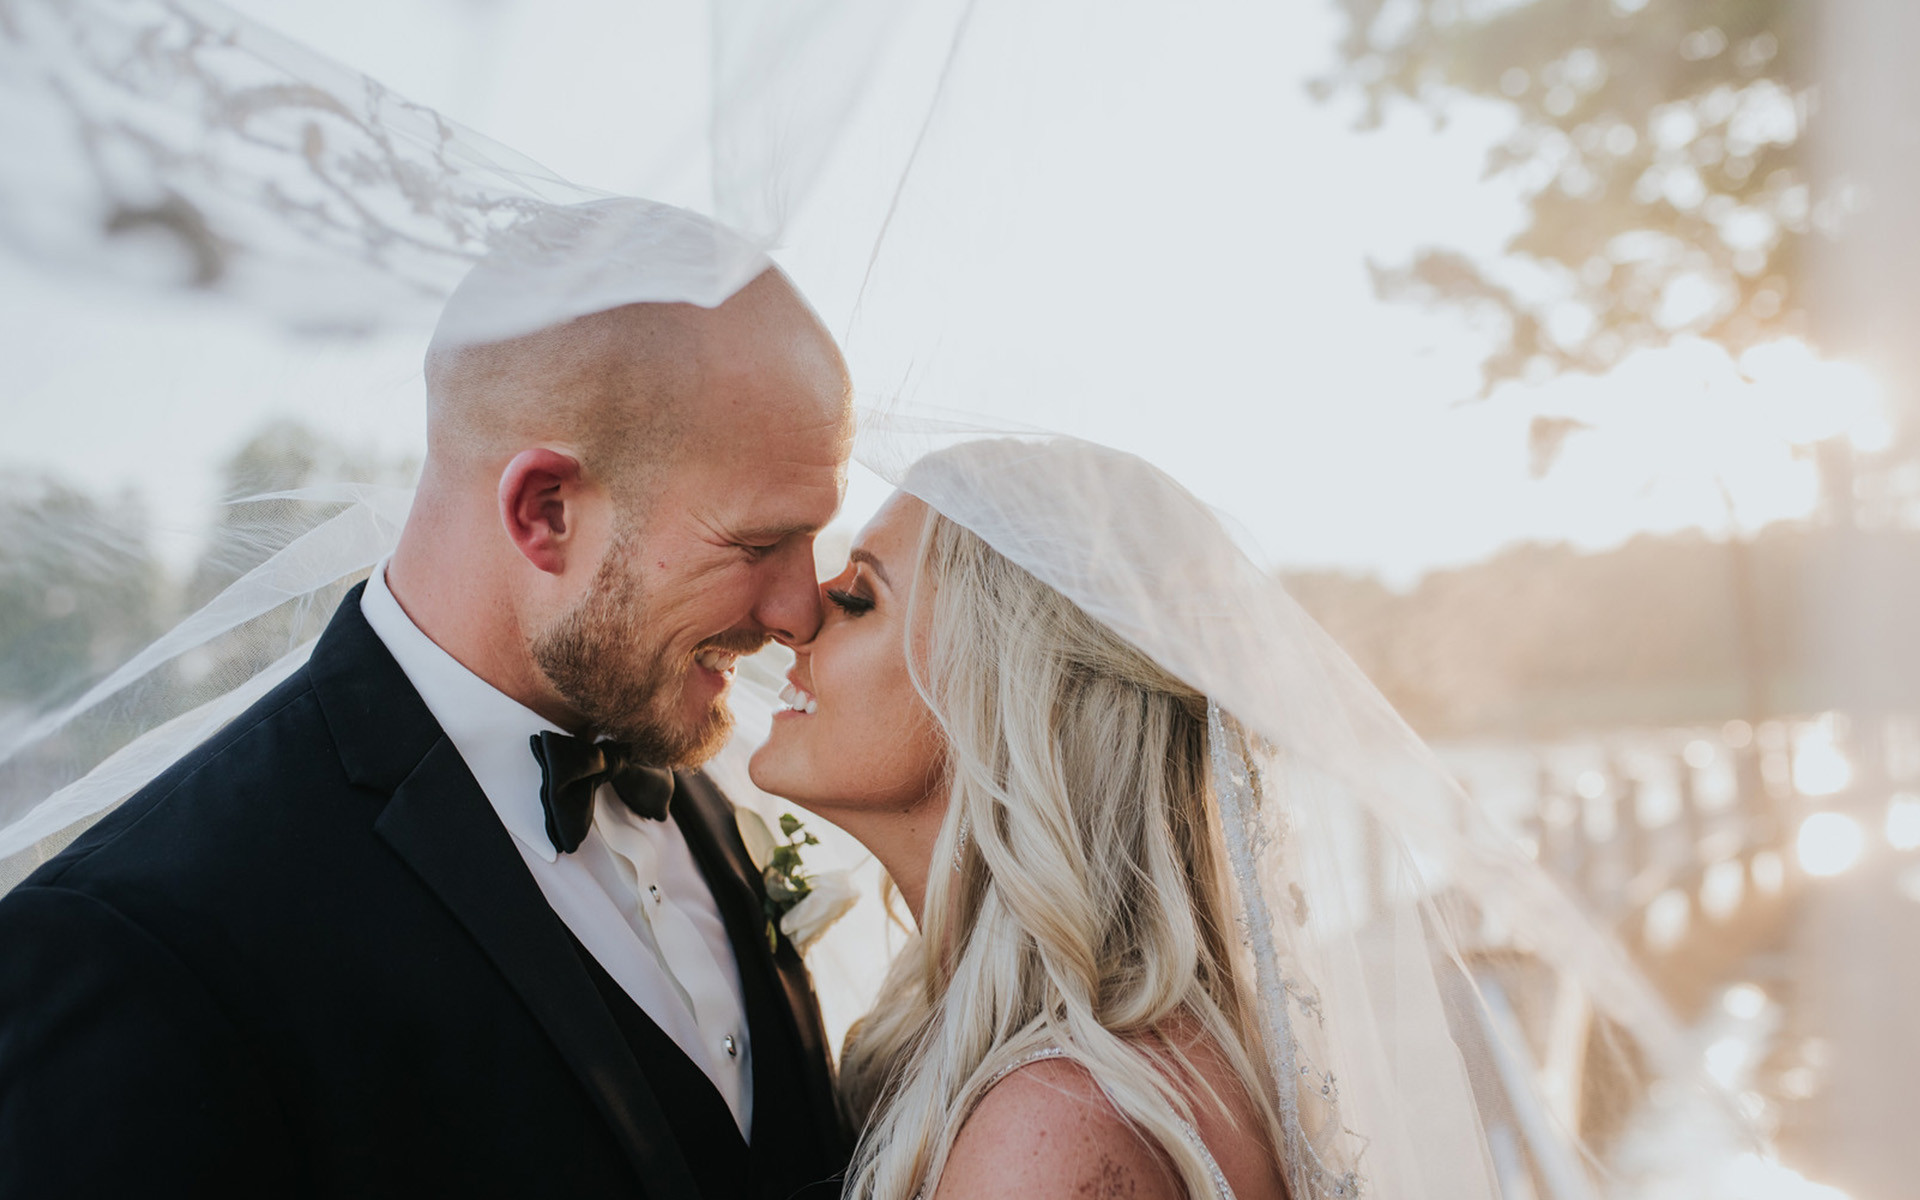 High School Sweethearts Finally Wed in Fairytale Formal Affair